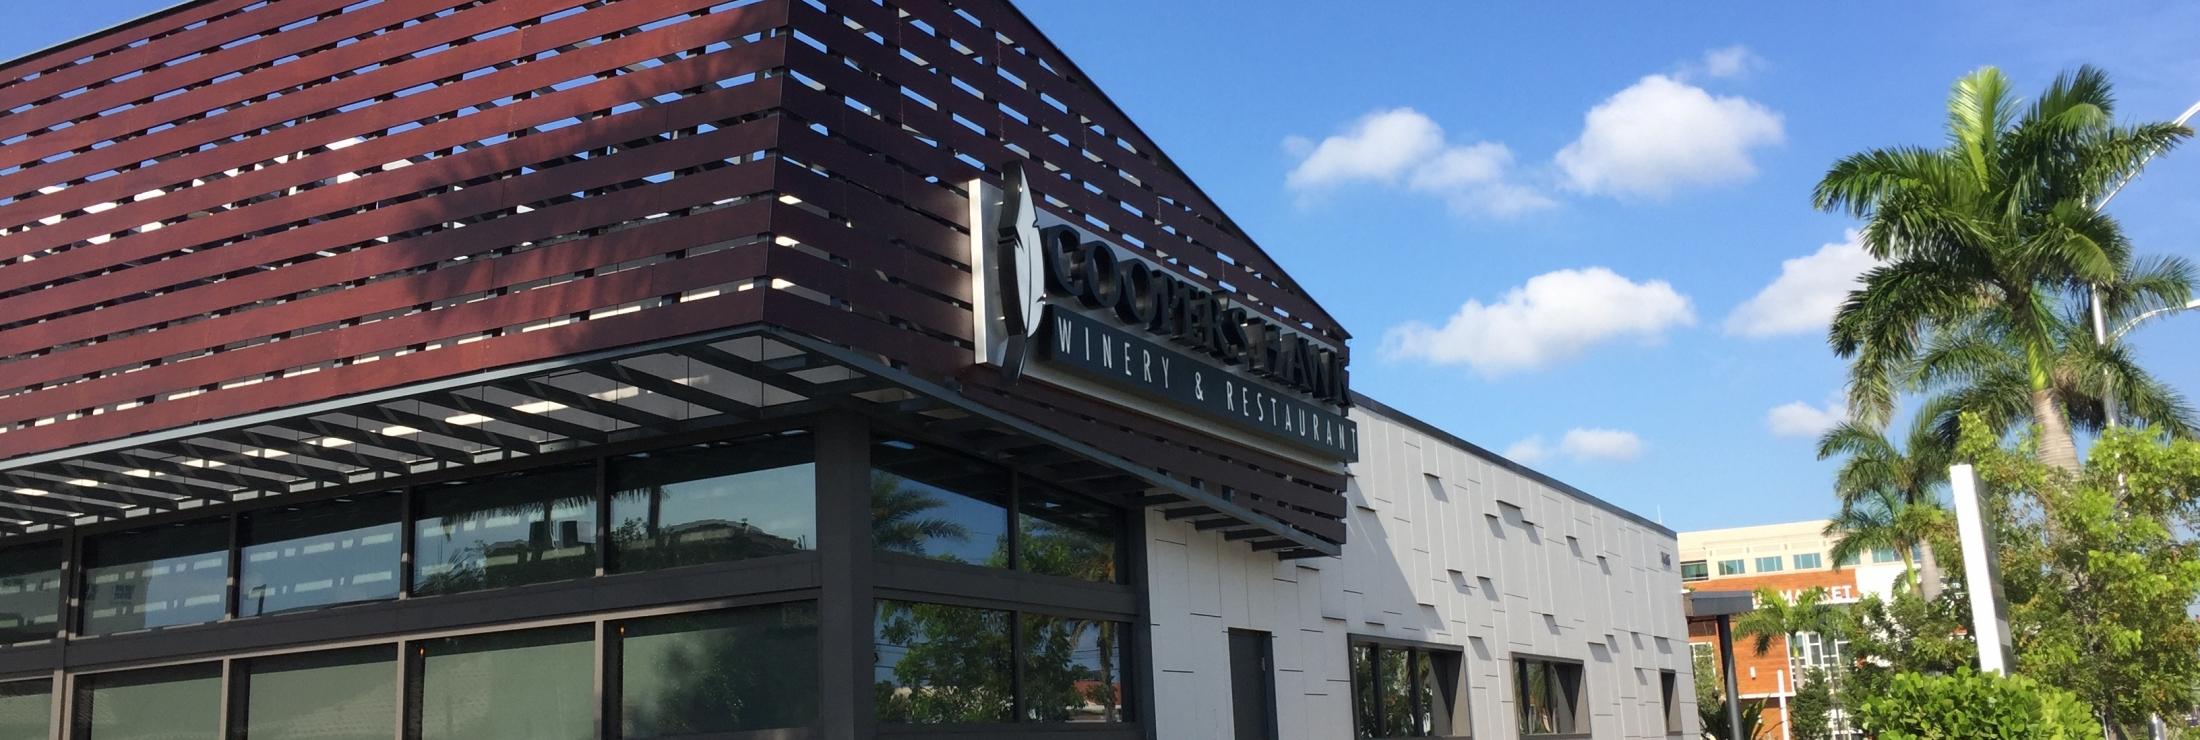 Cooper's Hawk Restaurant Doral FL - Swisspearl - Fiber Cement Panels